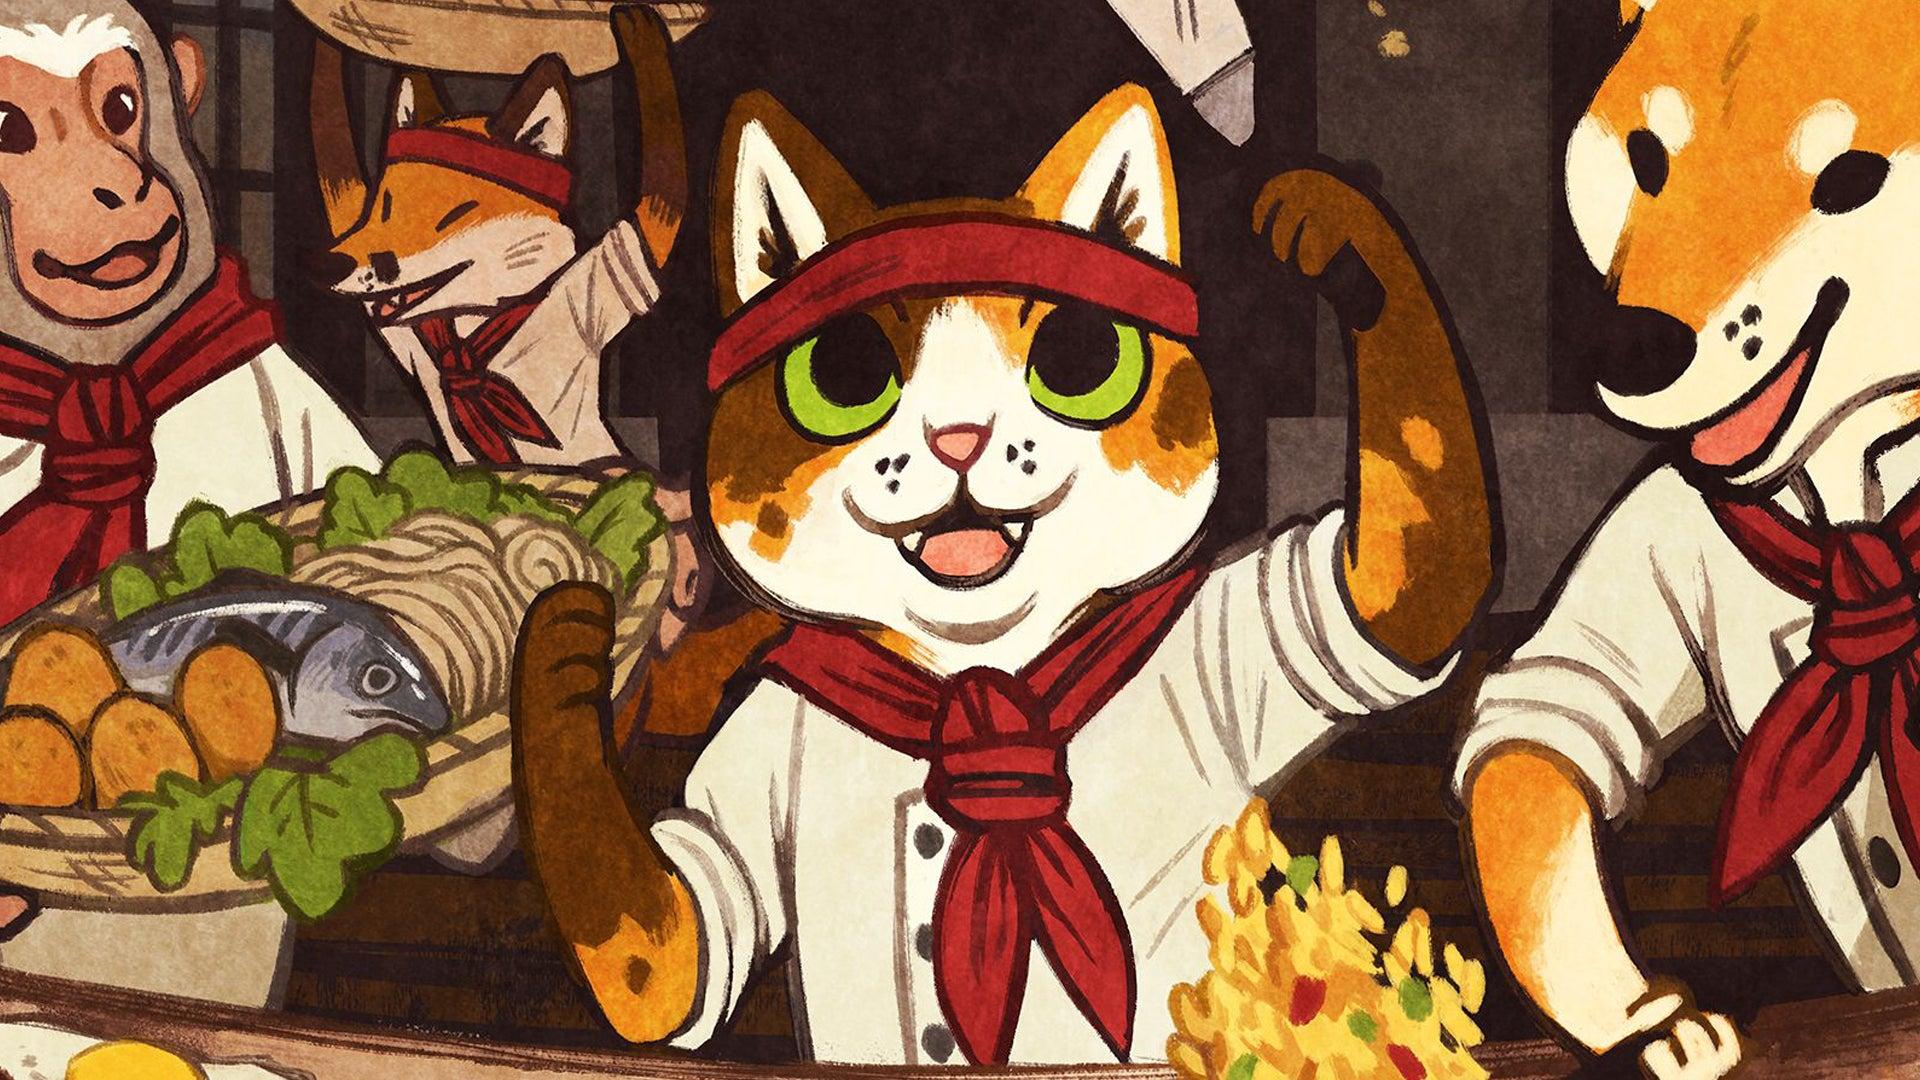 Hibachi board game artwork